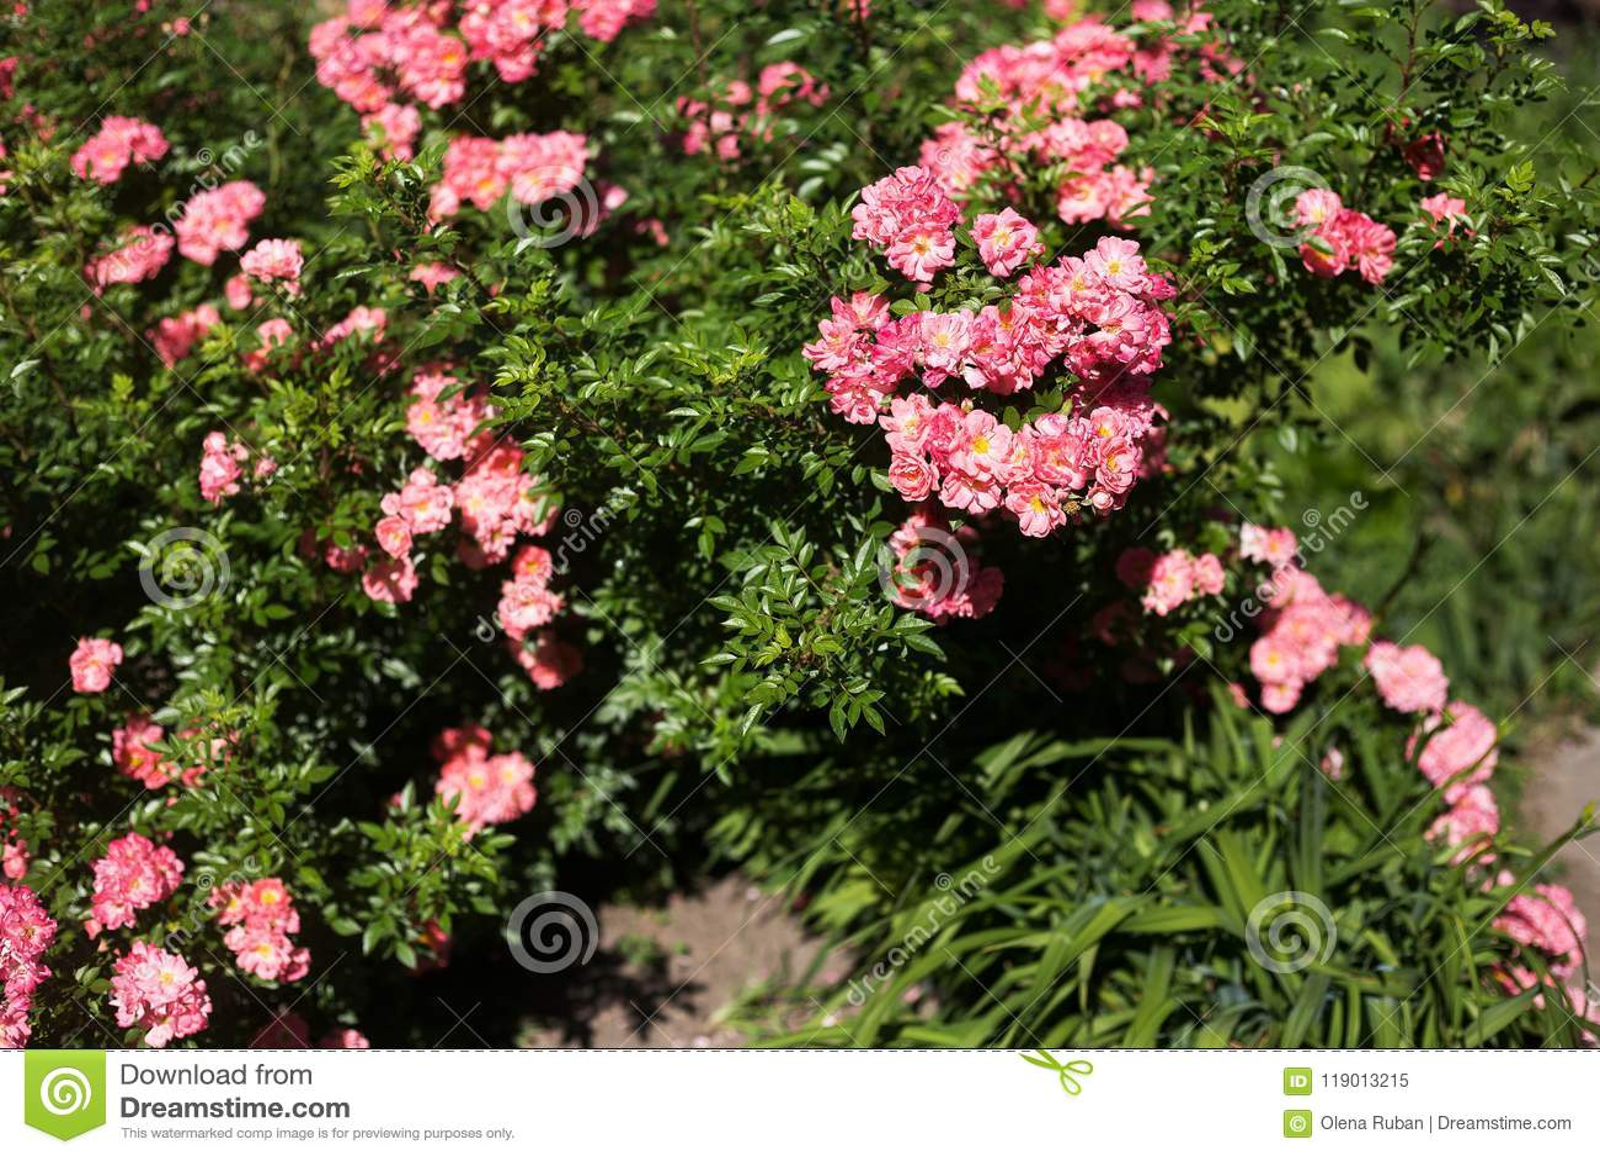 Little tea roses on bush stock image image of blossom 119013215 little tea roses on bush large bush with pink flowers mightylinksfo